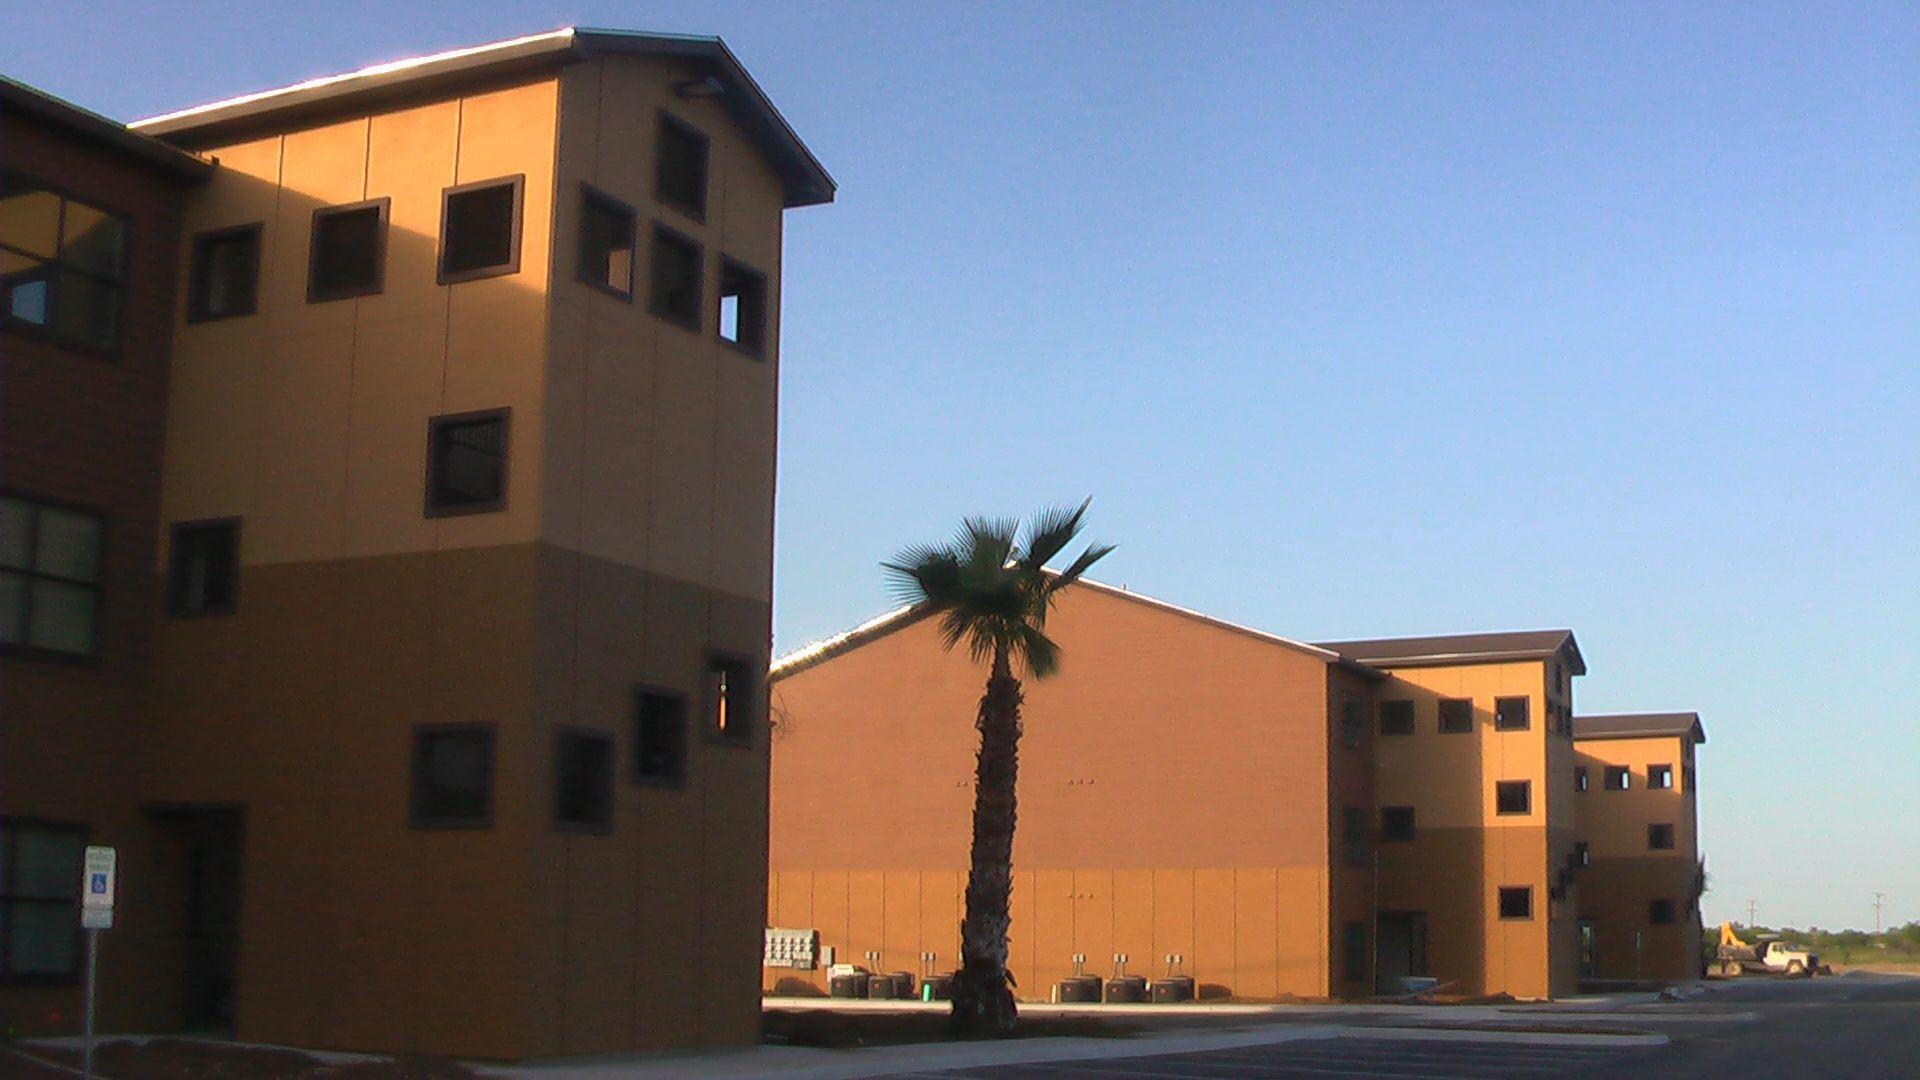 La Villita apartments in Carrizo Springs Tx Corporate Housing